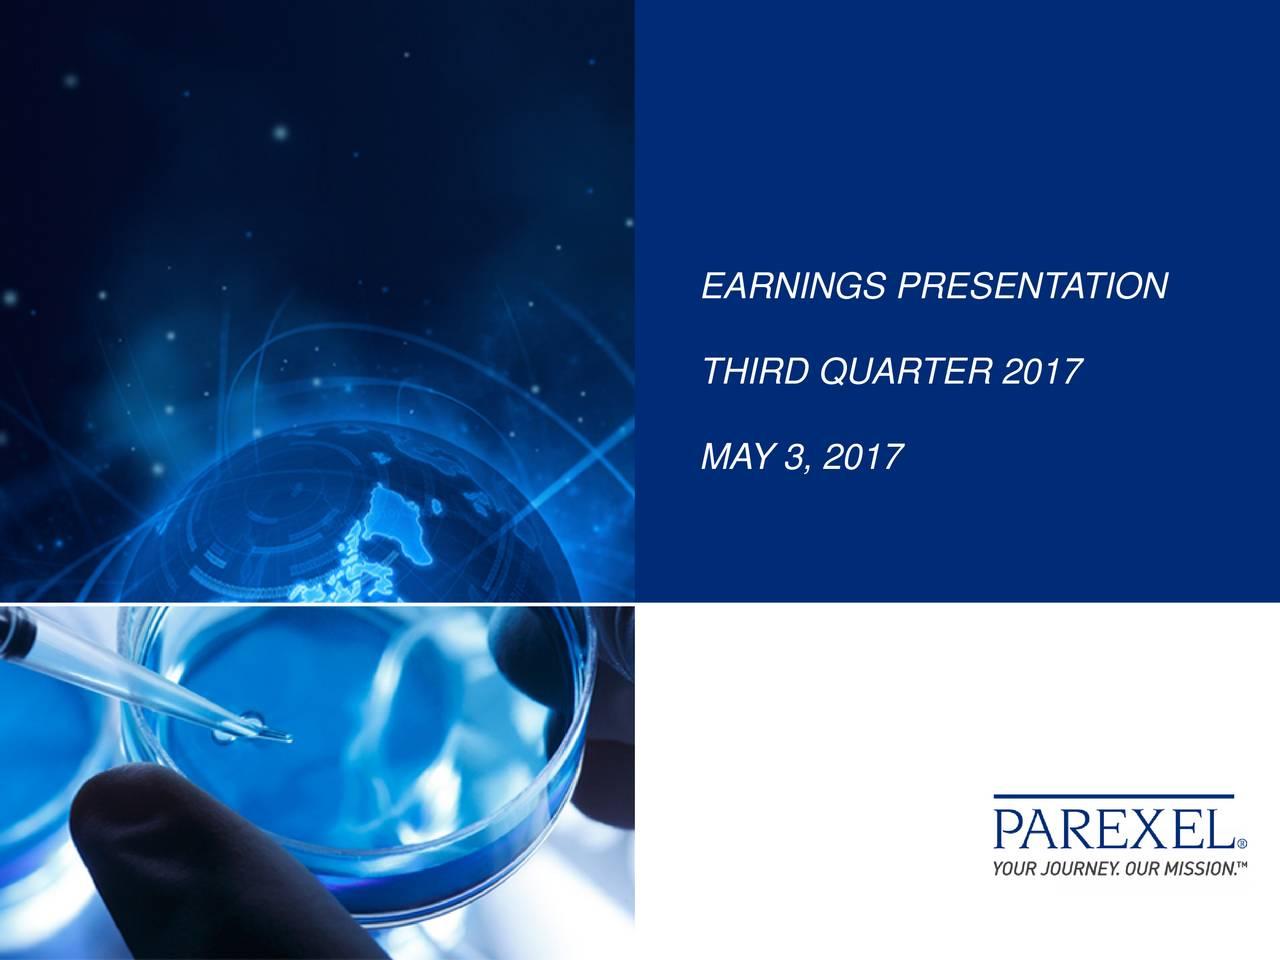 parexel international corporation 2017 q3